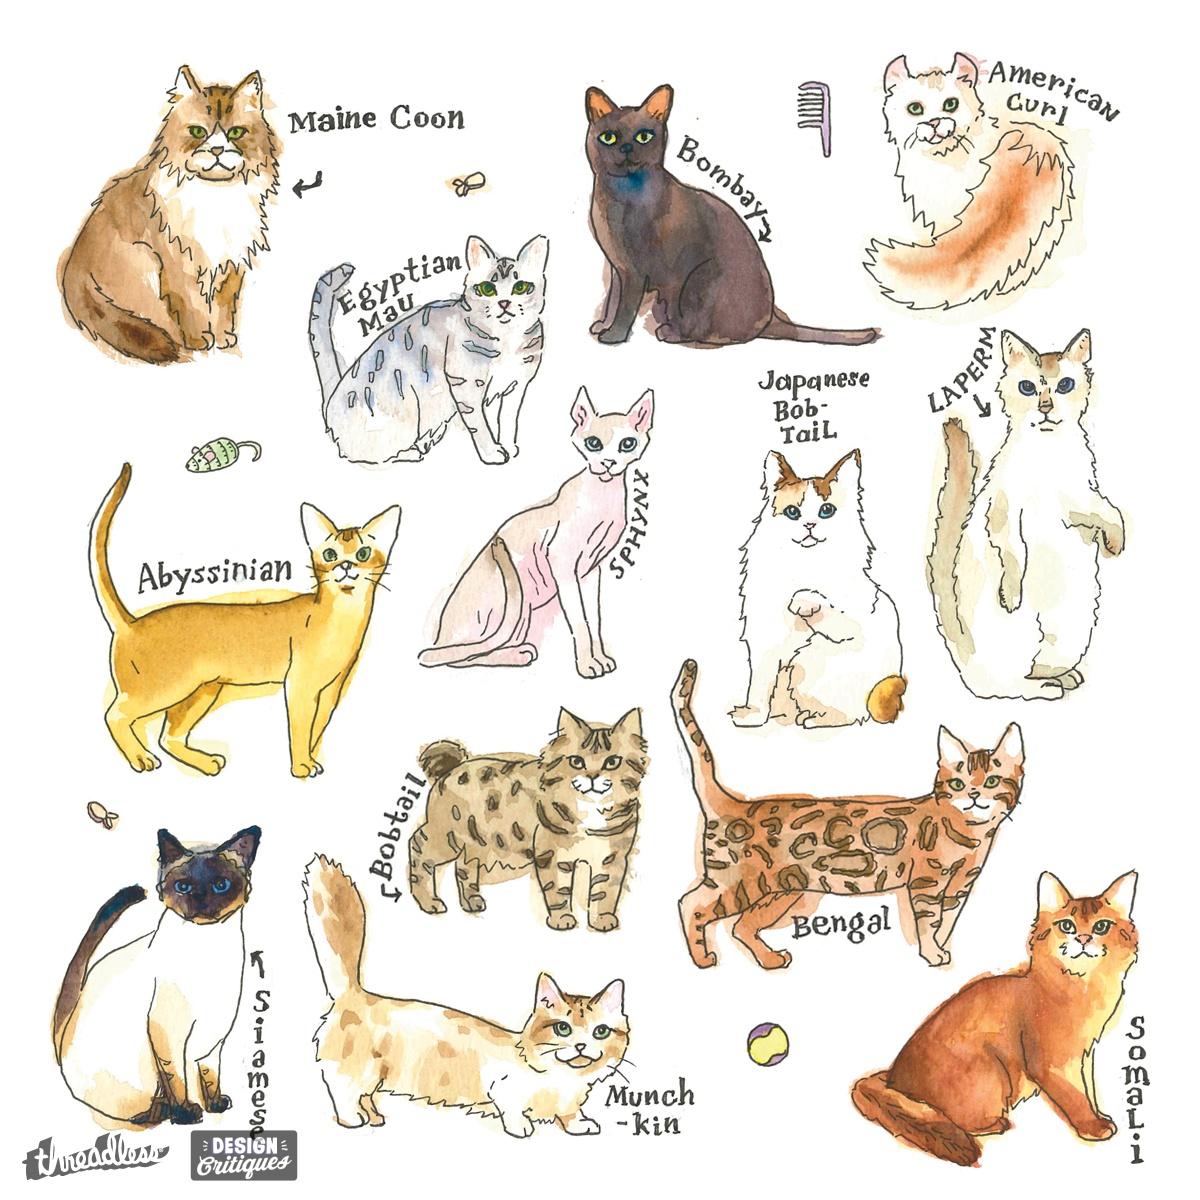 Score Cat Breeds by jiajiaen 923 on Threadless